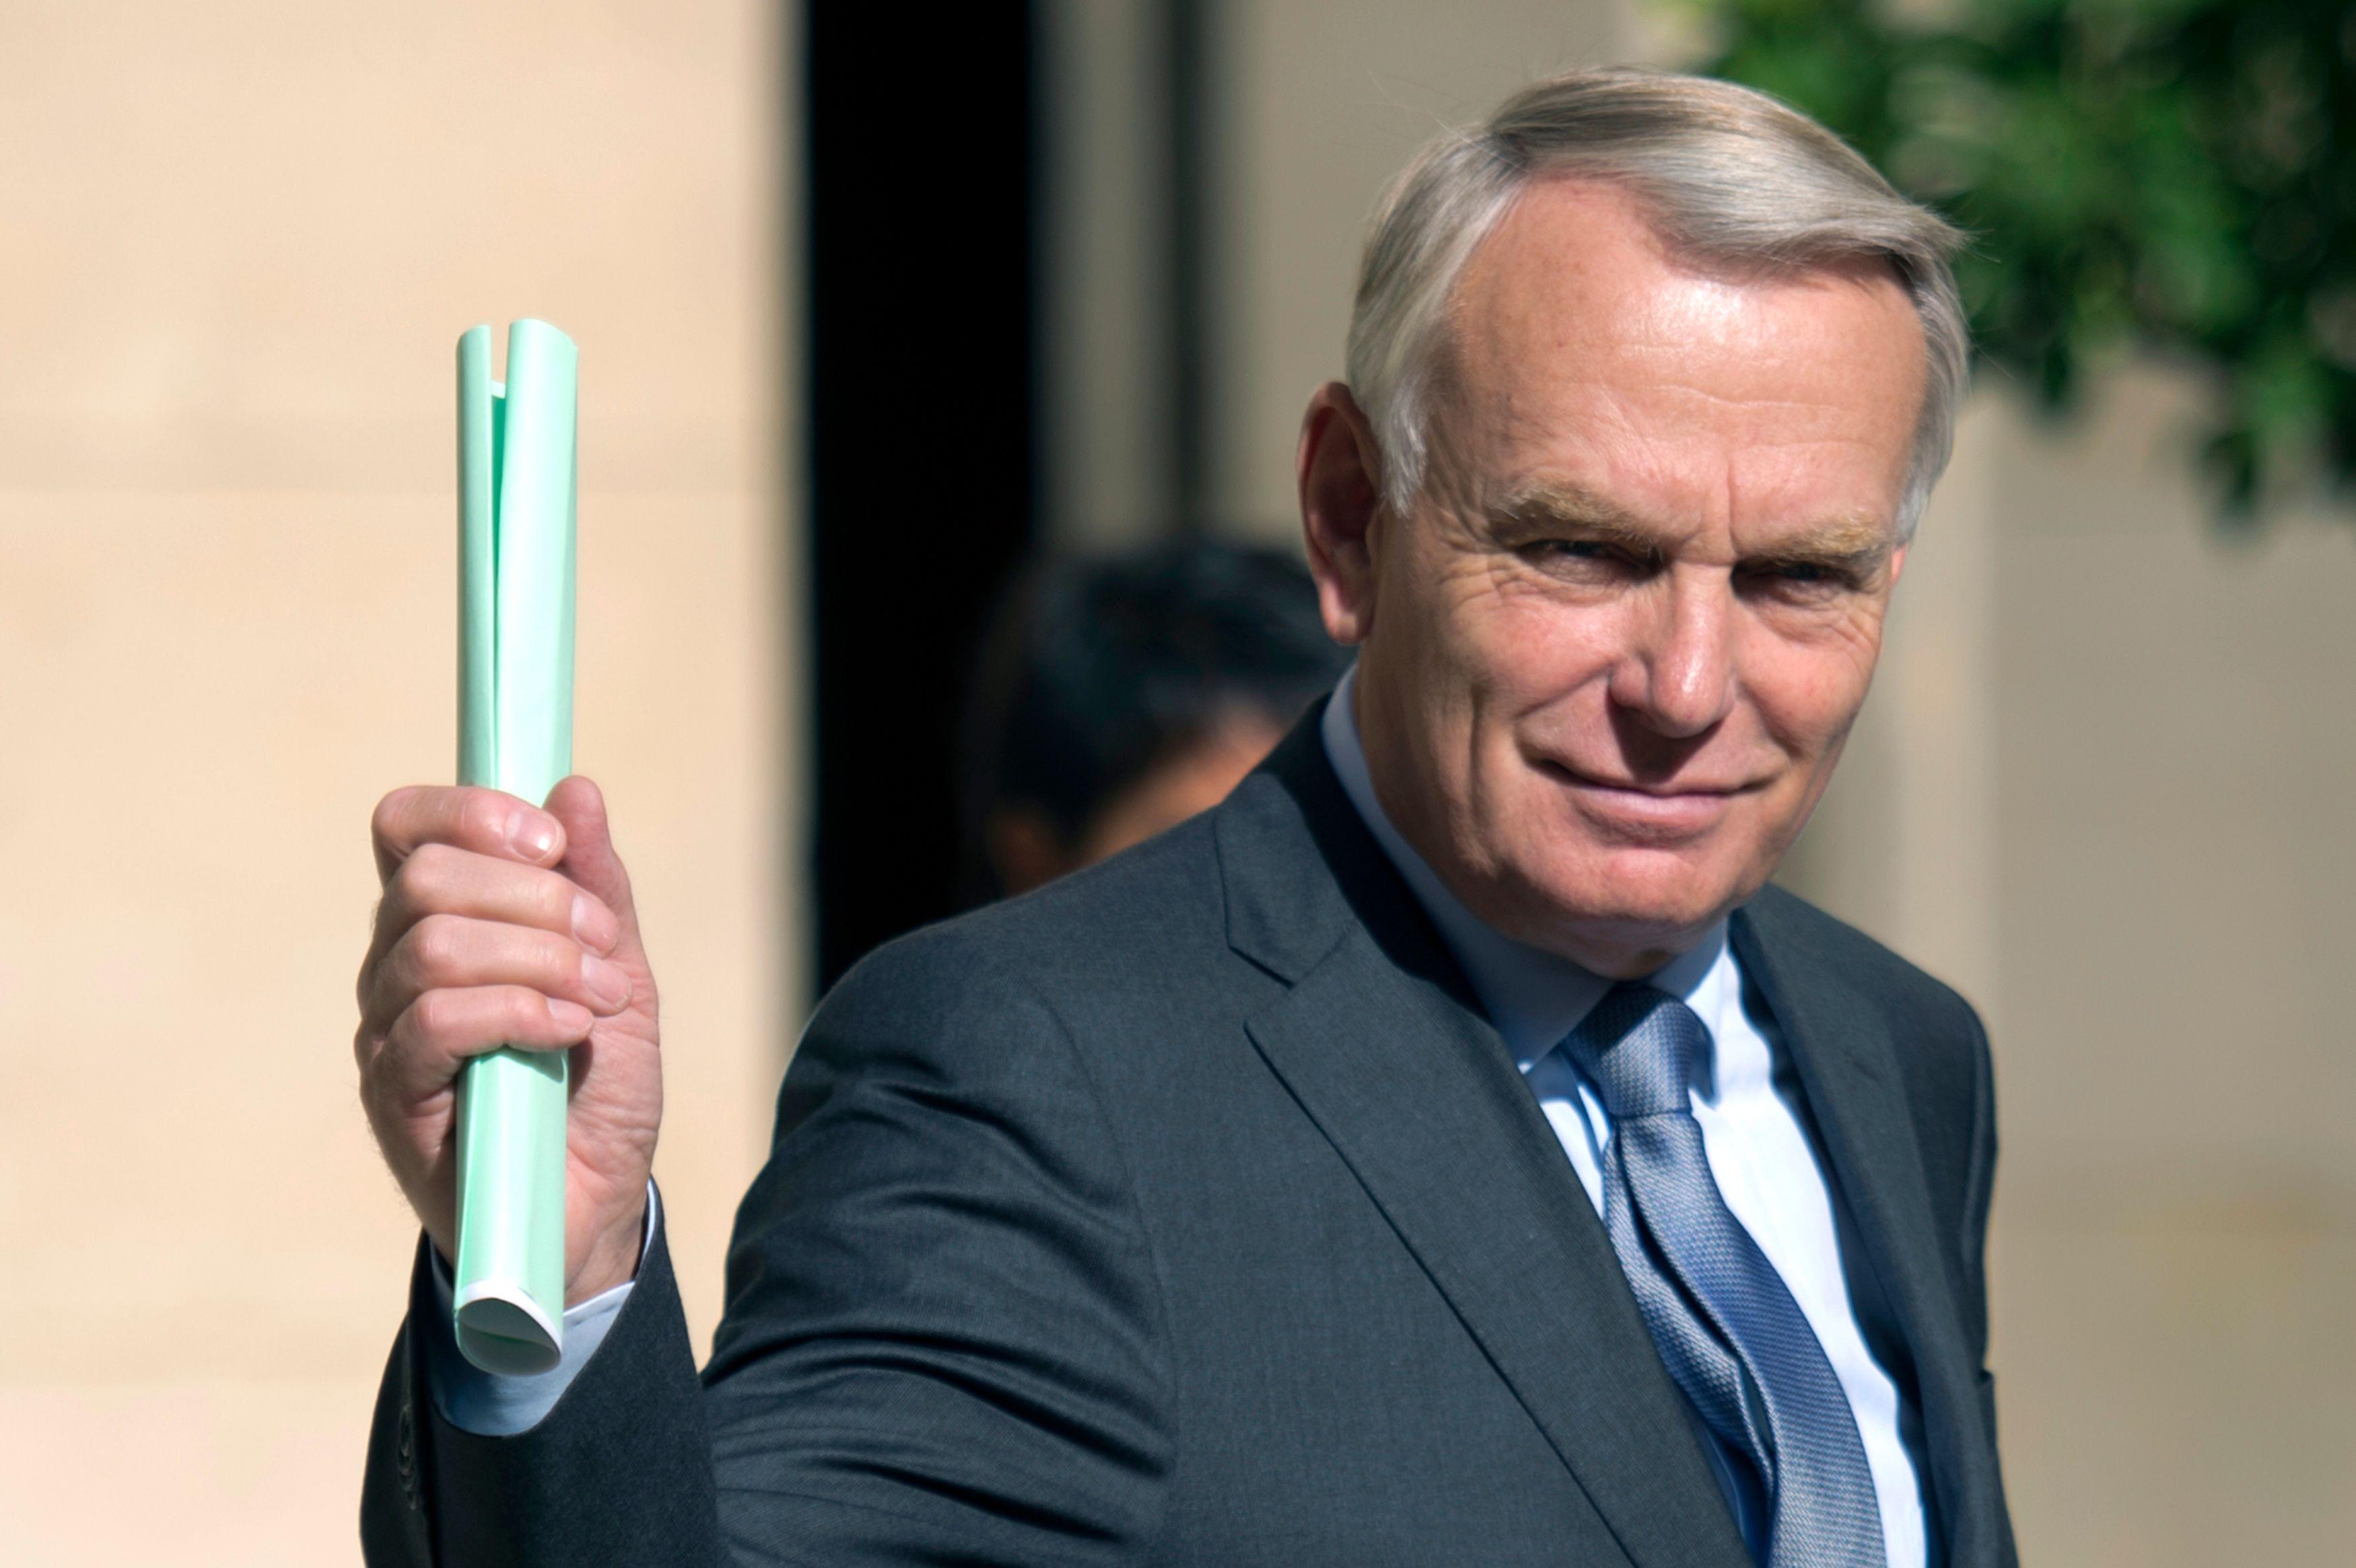 Le Premier ministre Jean-Marc Ayrault consulte lundi syndicats et organisations patronales.